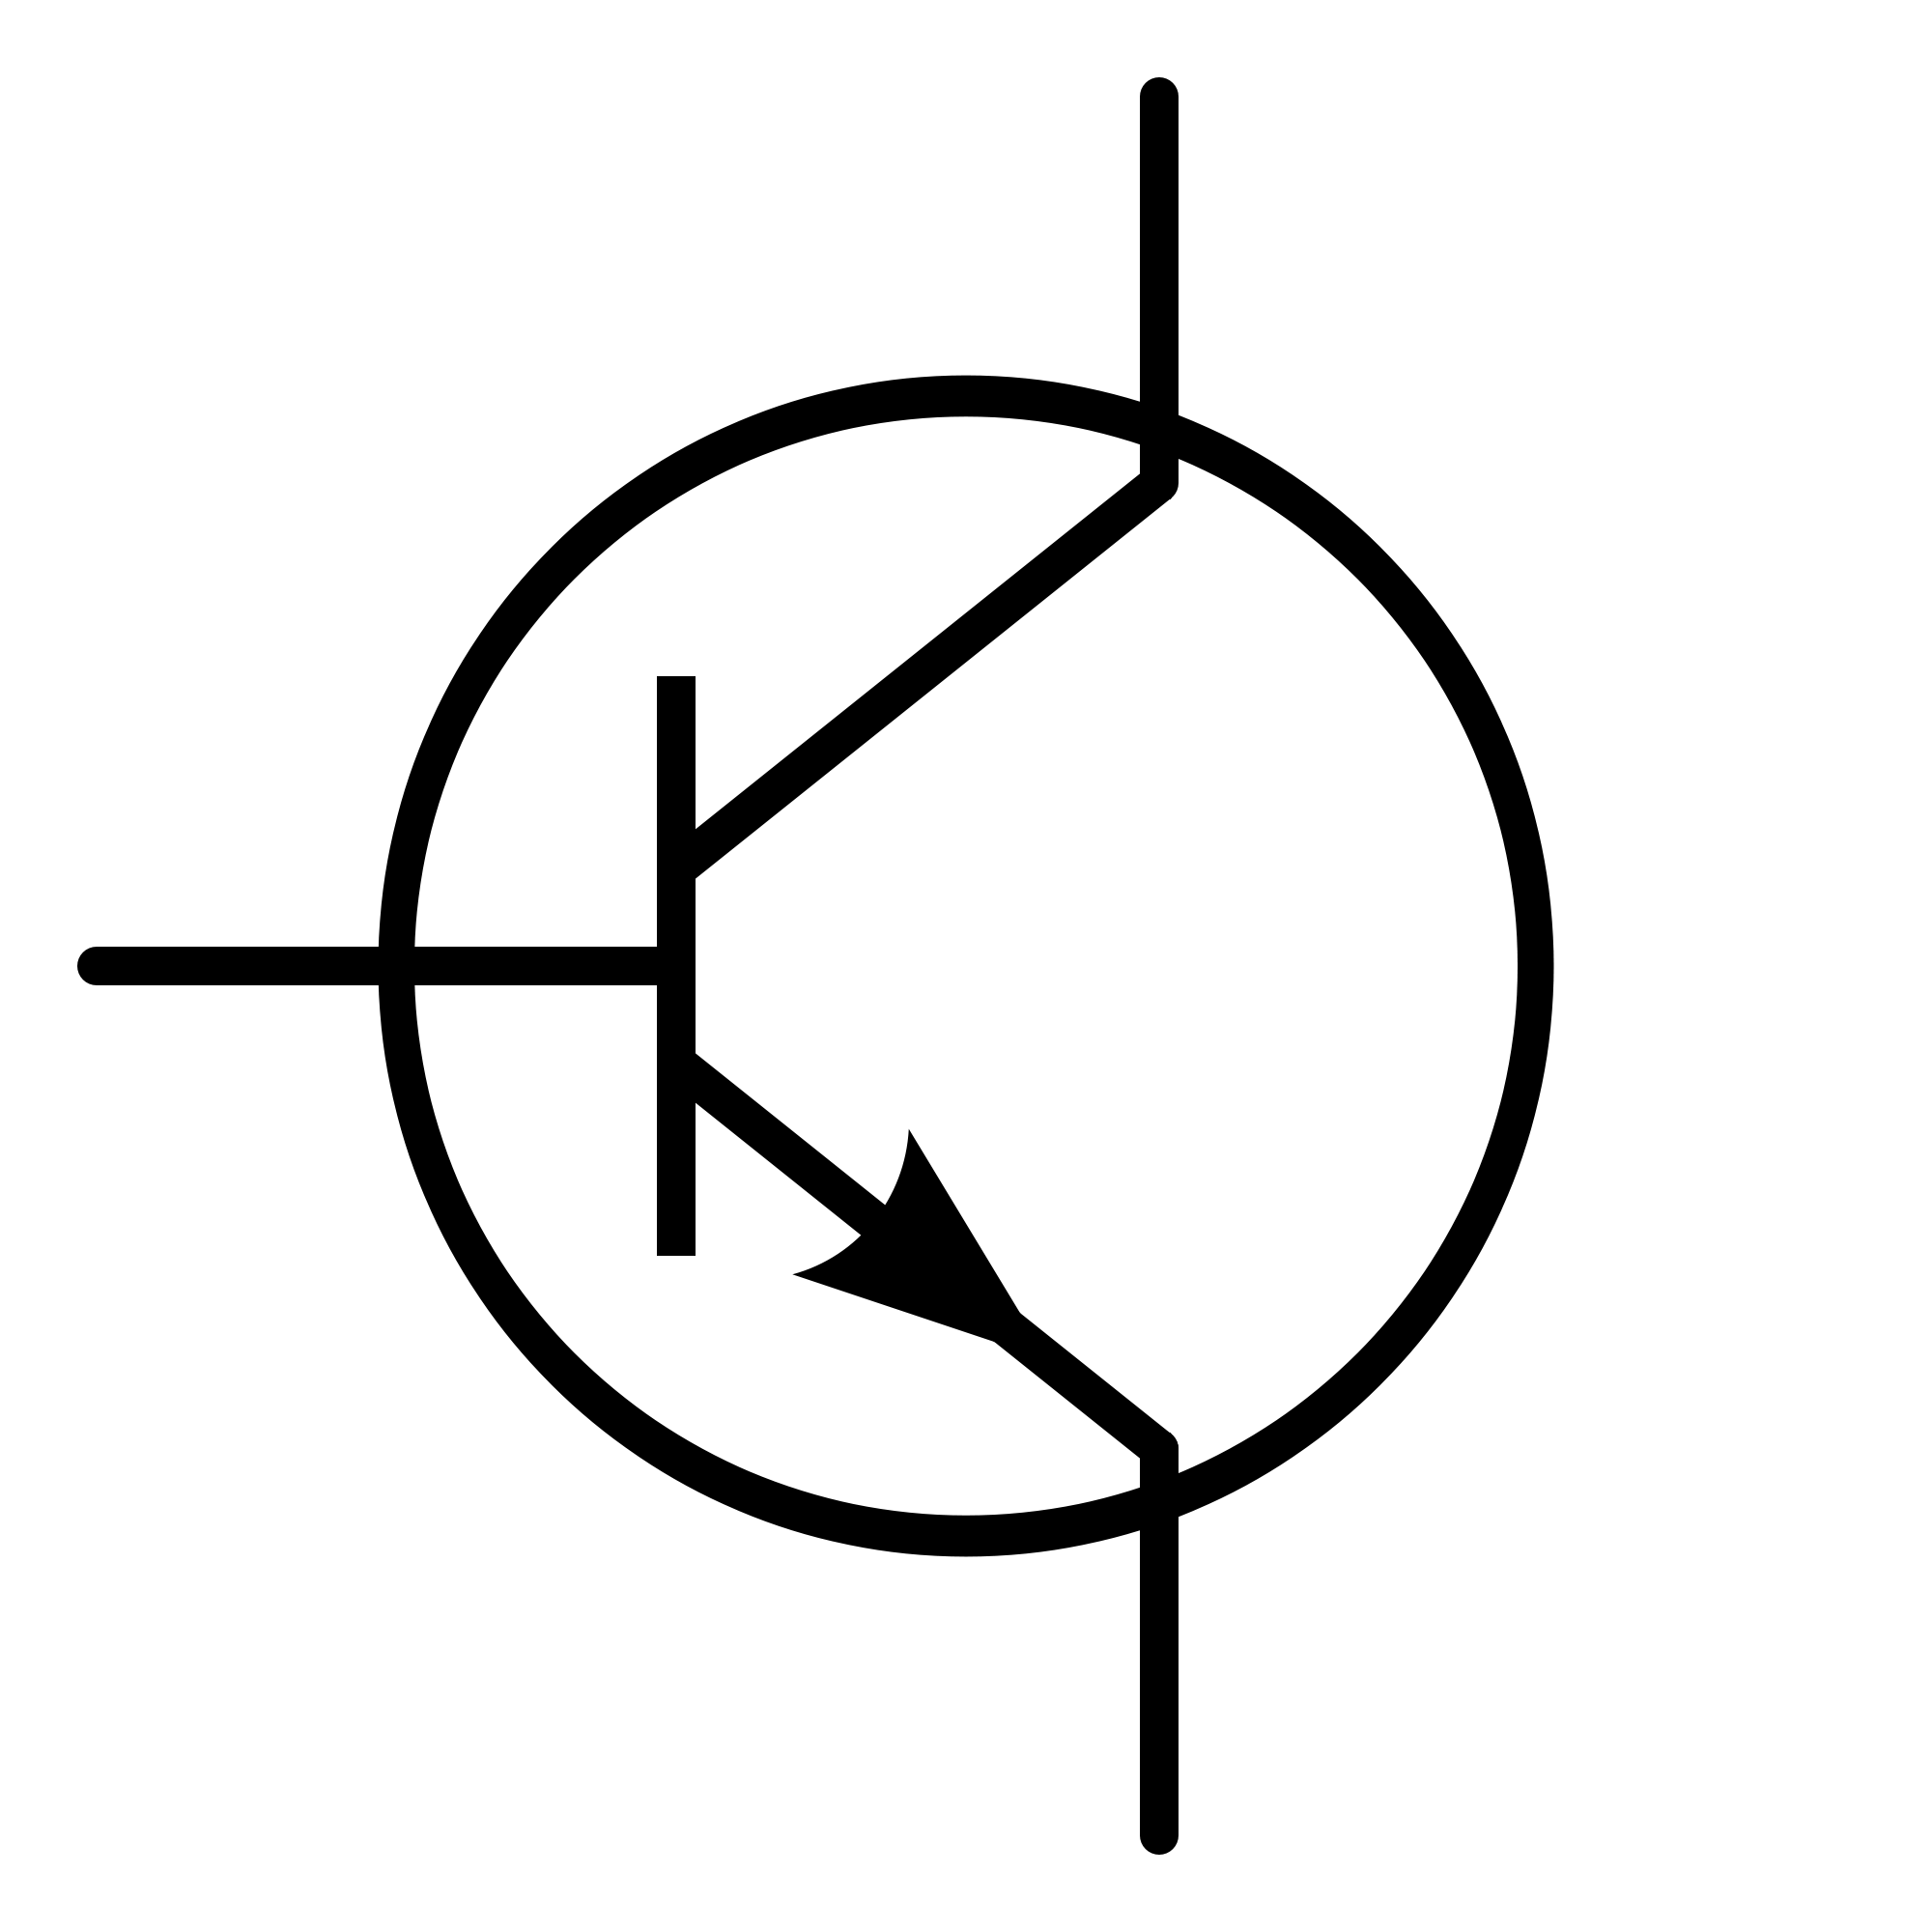 Symbol for a transistor